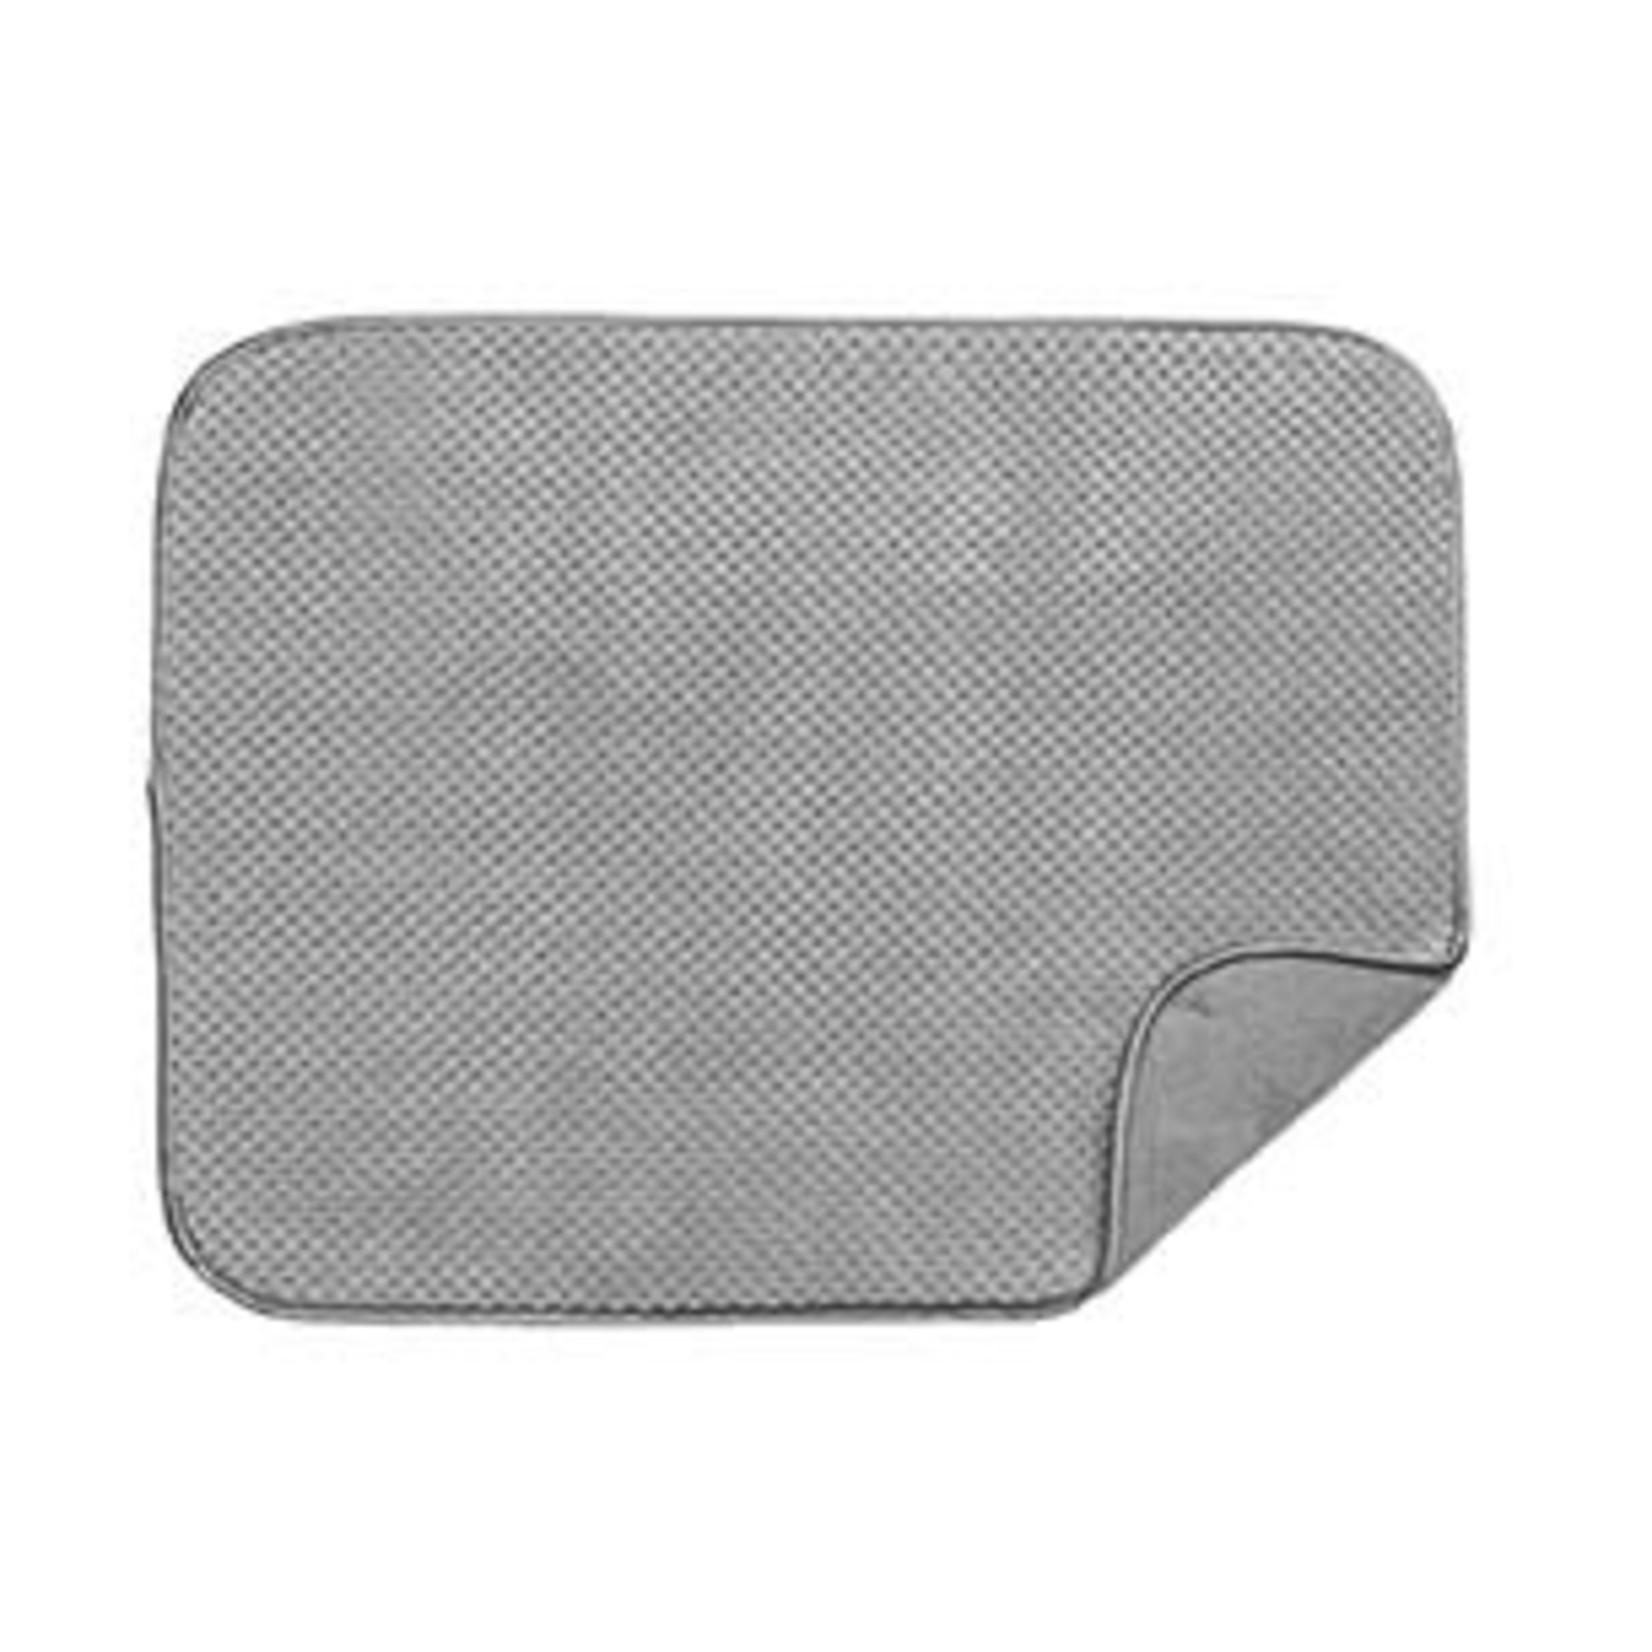 Luxe Plush Oversized Drying Mat Grey